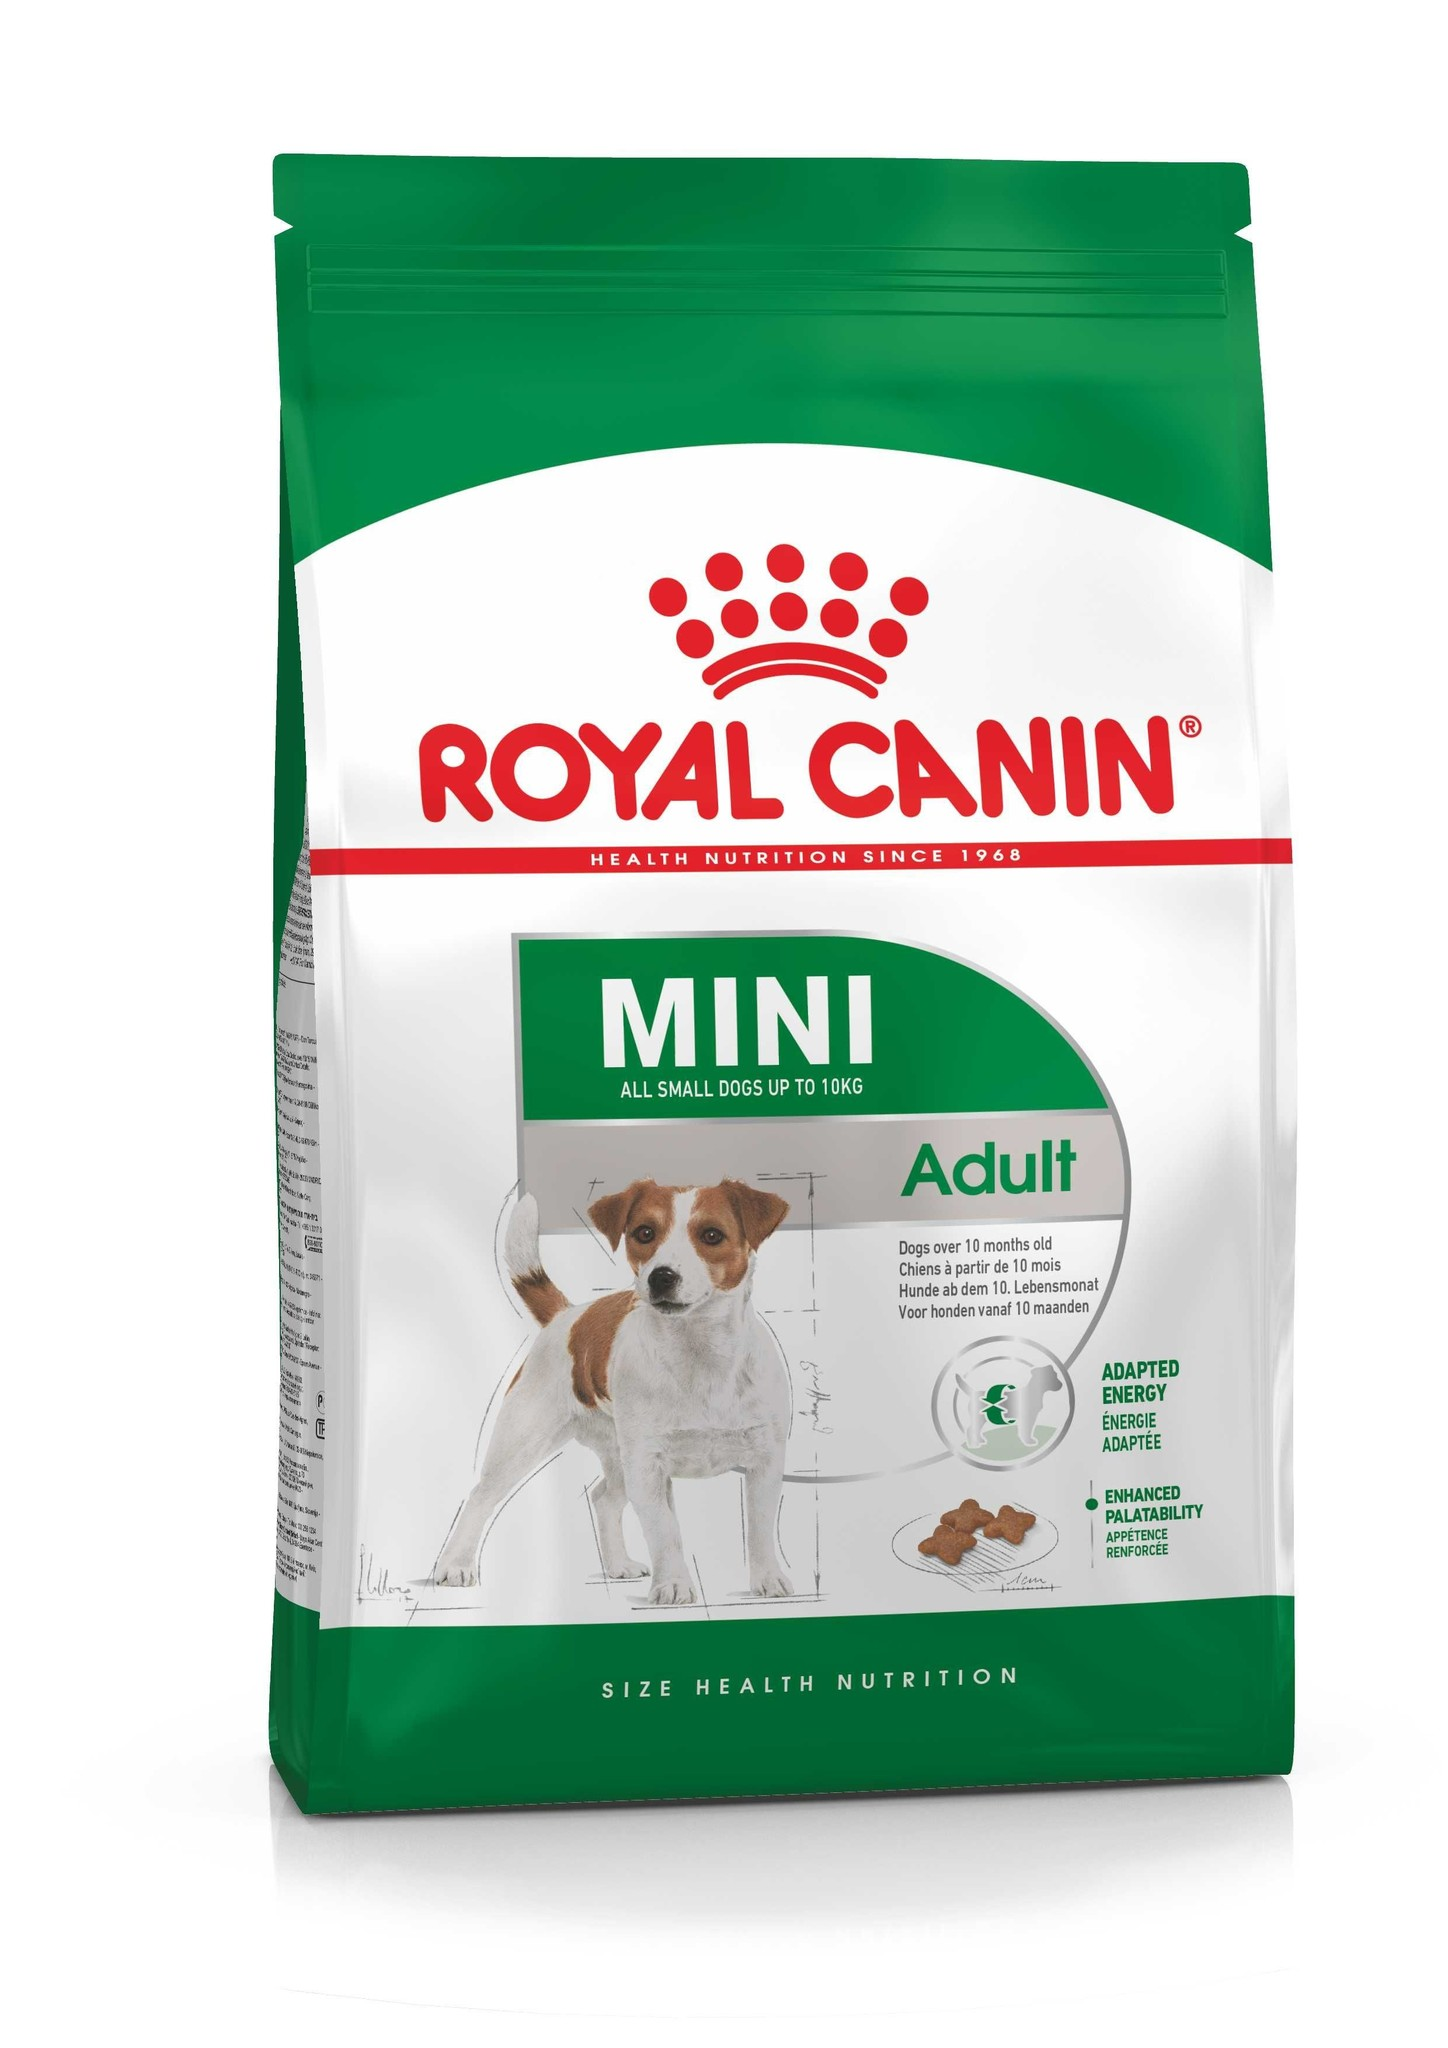 Royal Canin Royal Canin mini adult 8kg